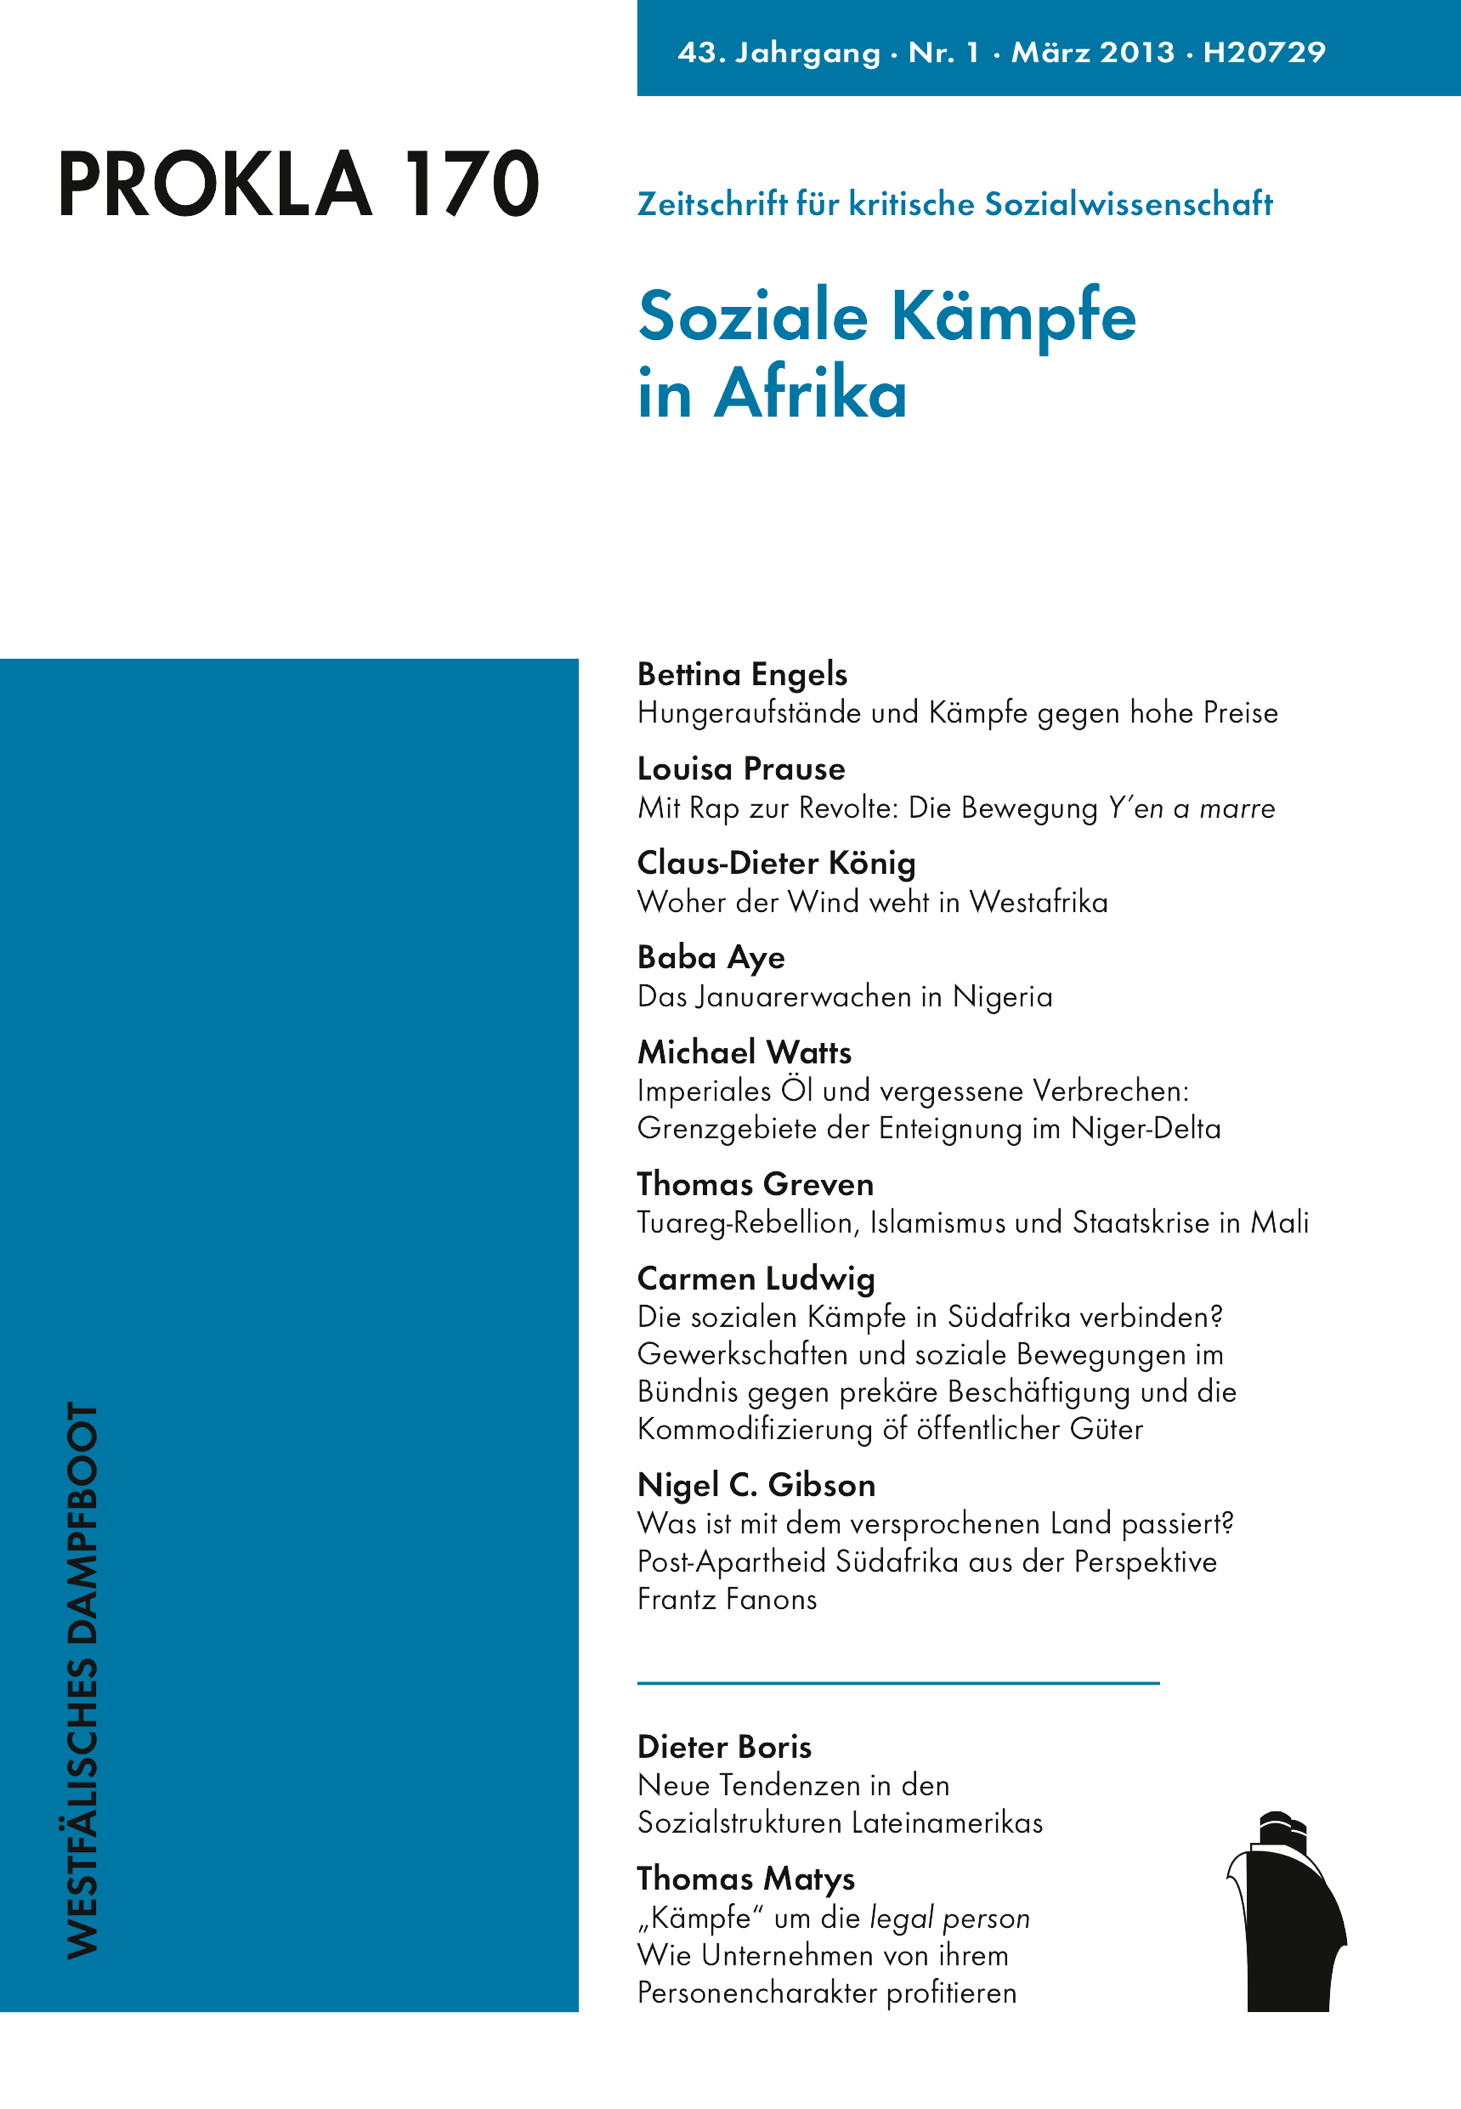 Ansehen Bd. 43 Nr. 170 (2013): Soziale Kämpfe in Afrika